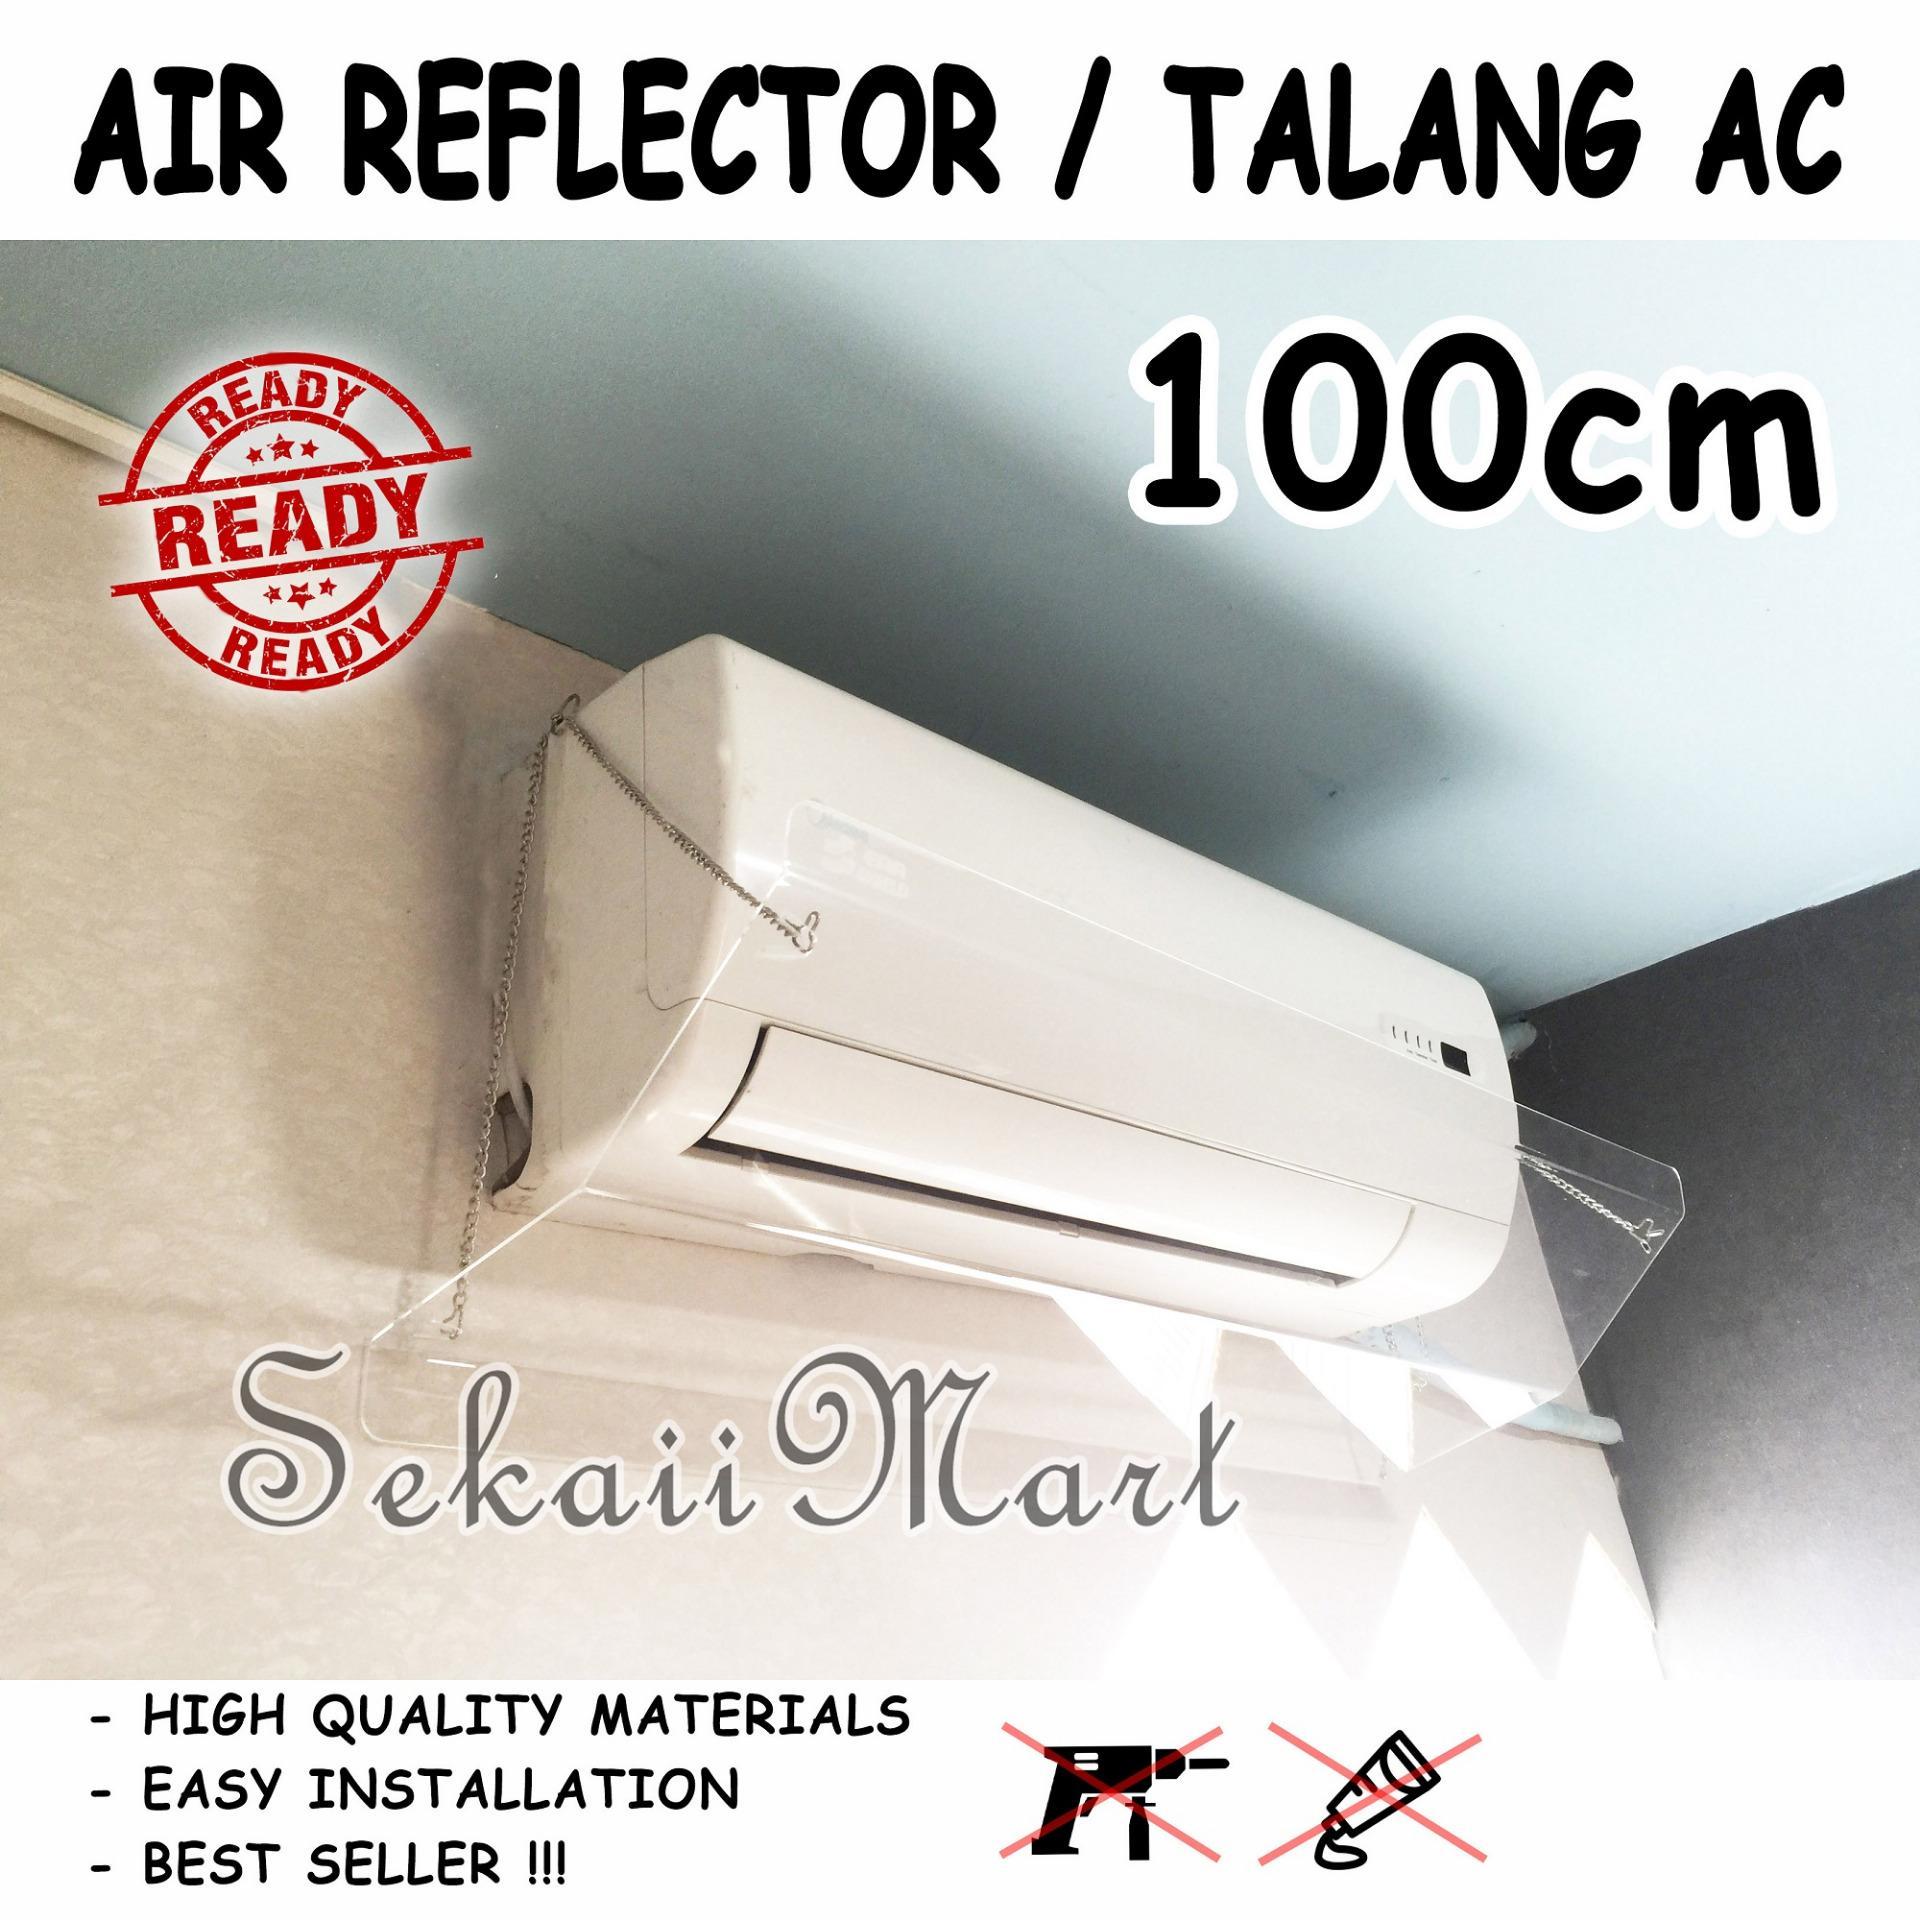 ES100 - TALANG AC ACRYLIC - AKRILIK AC - PENAHAN HEMBUSAN ANGIN AC 100cm